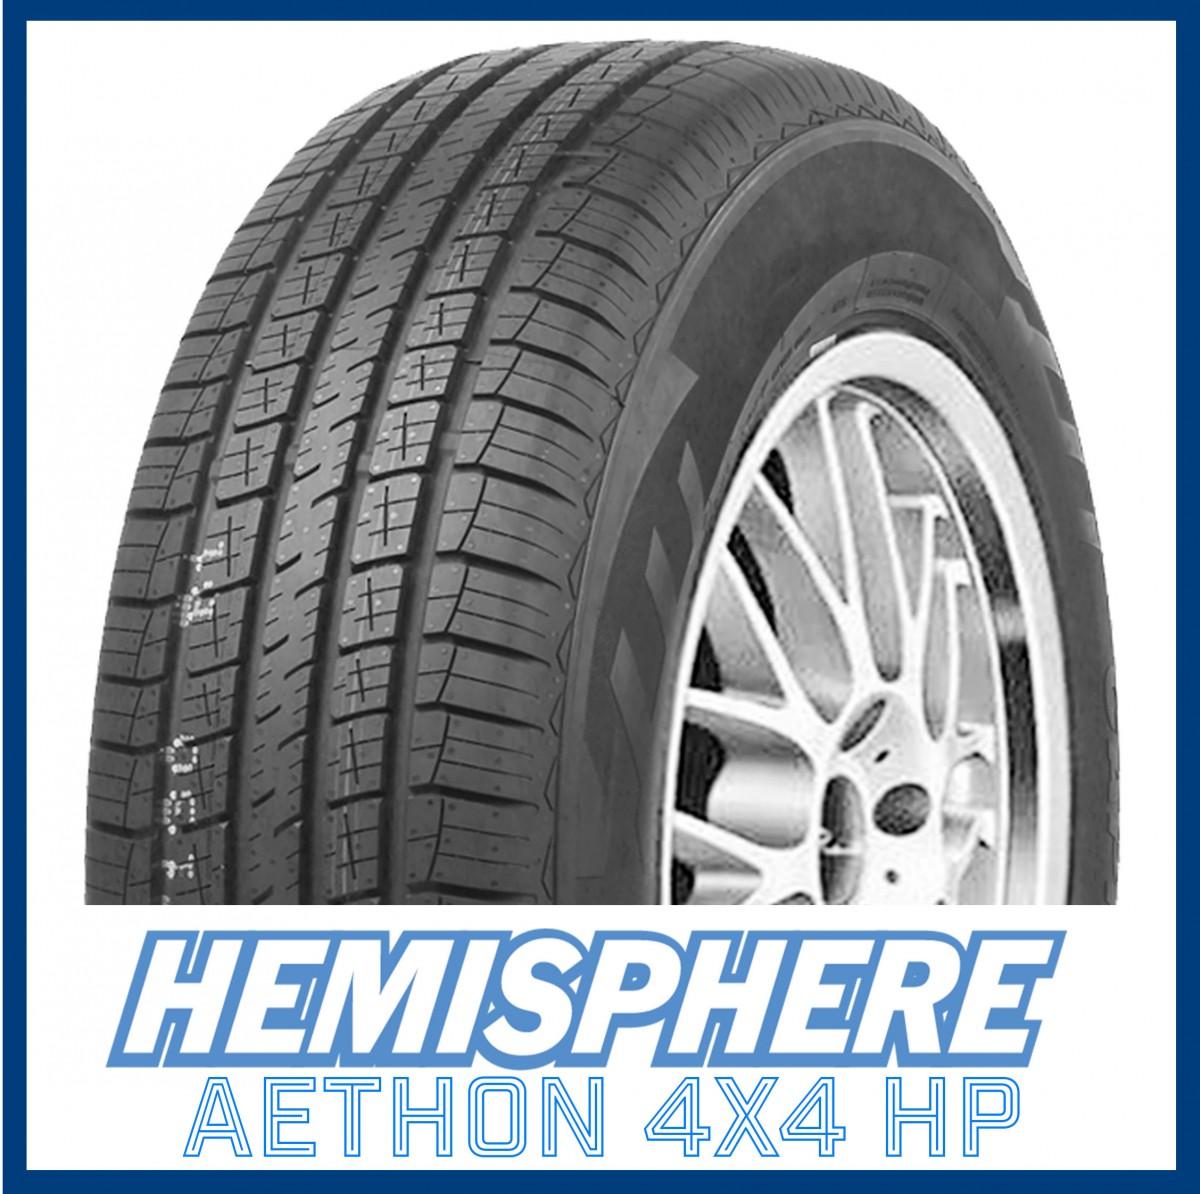 4x4 aethon hemisphere tires hp